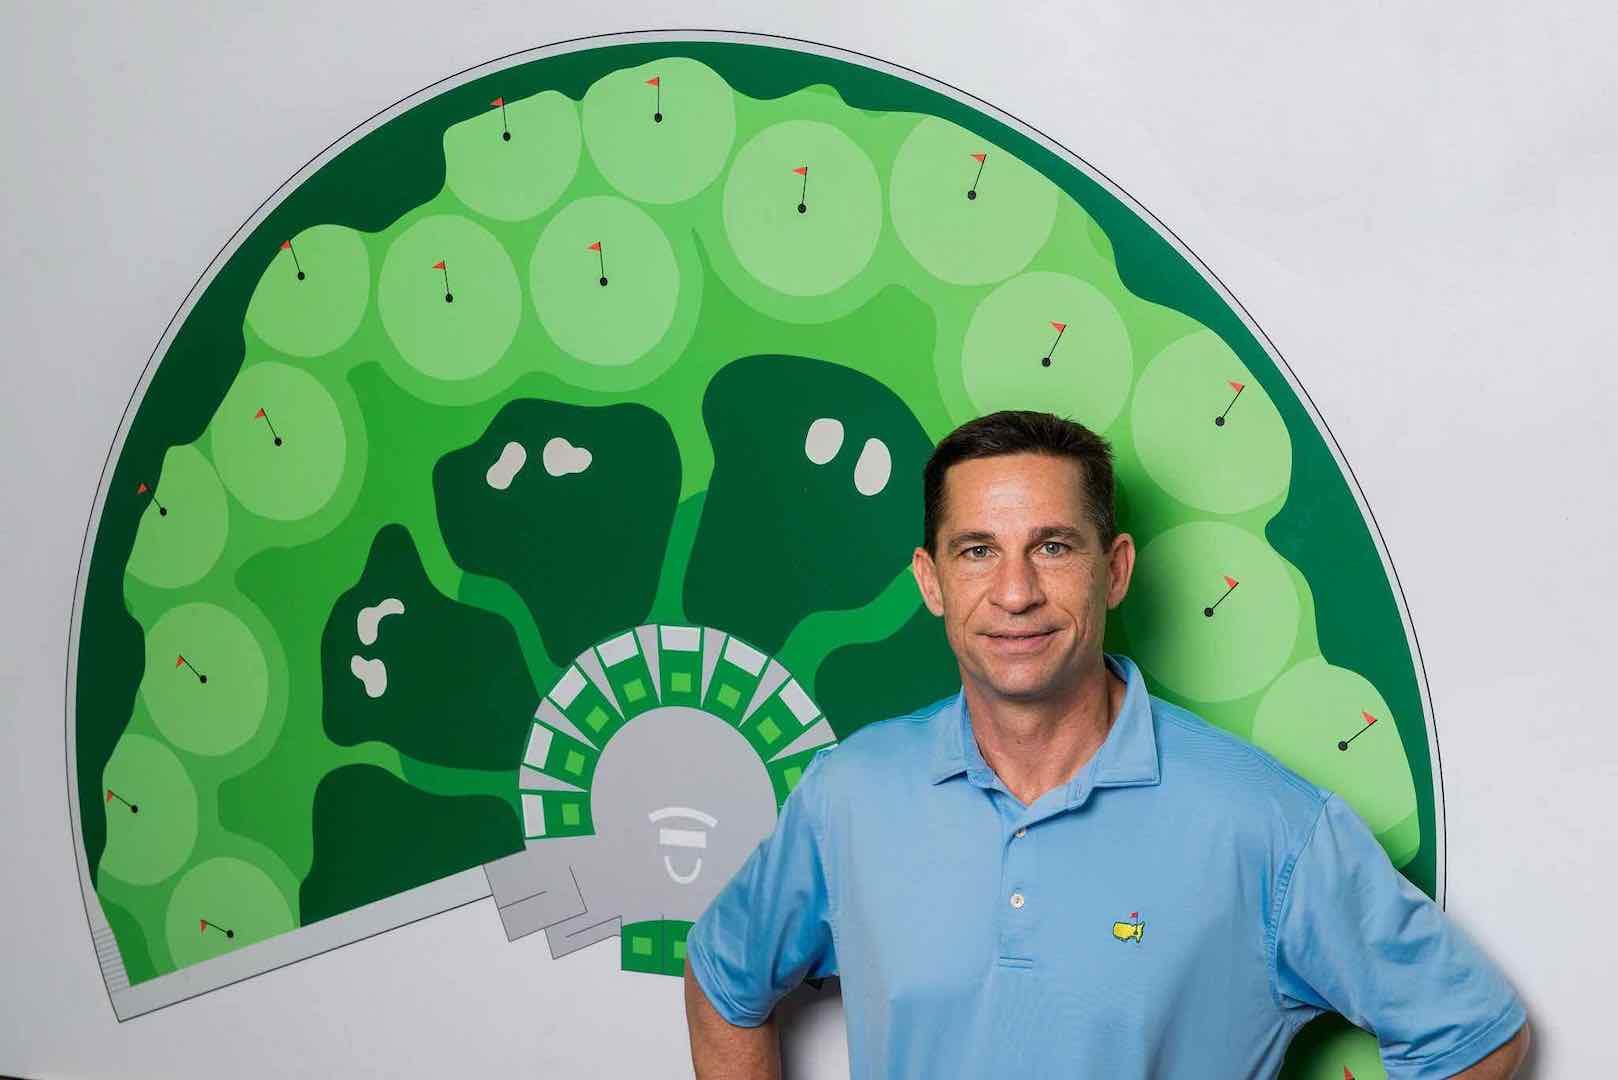 f589e6d1fd REALiTEE Golf s first site announced - GolfPunkHQ